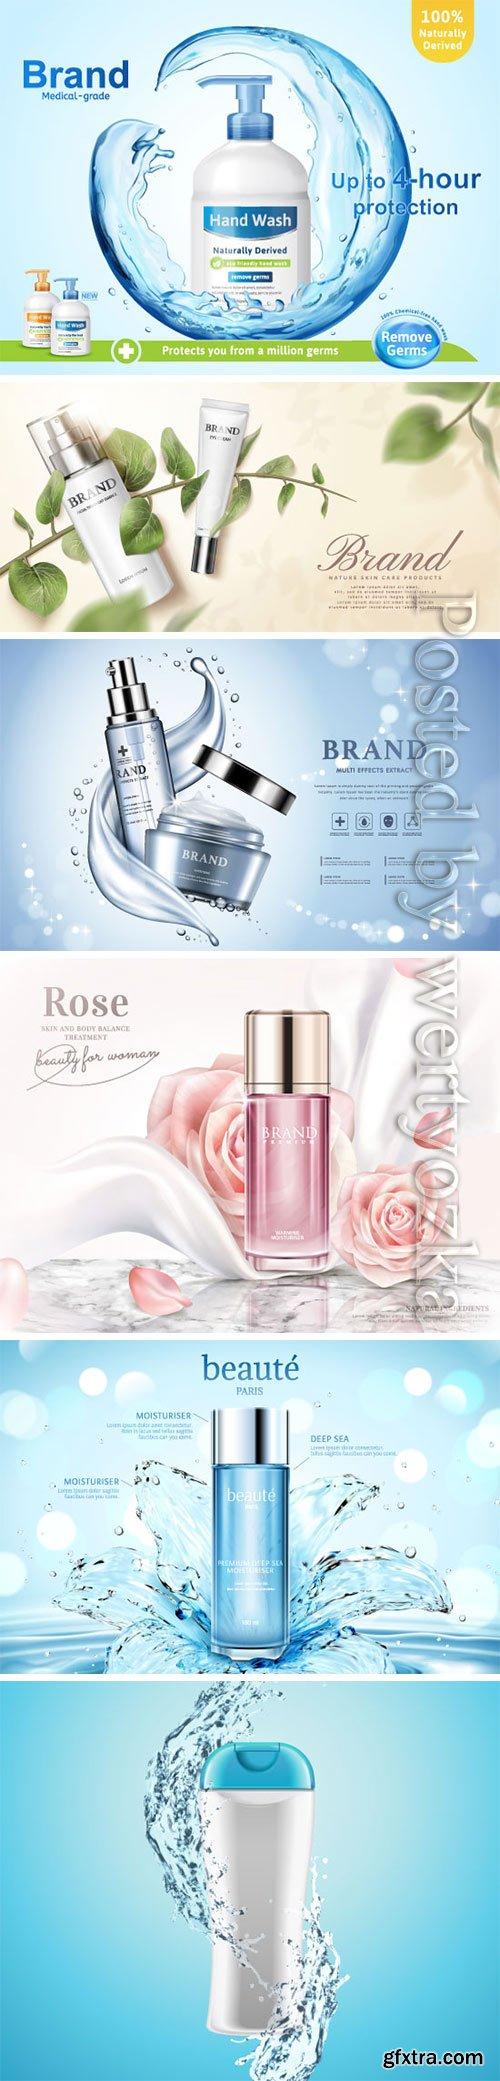 Cosmetics advertising vector posters, perfume, cream, nail polish # 2